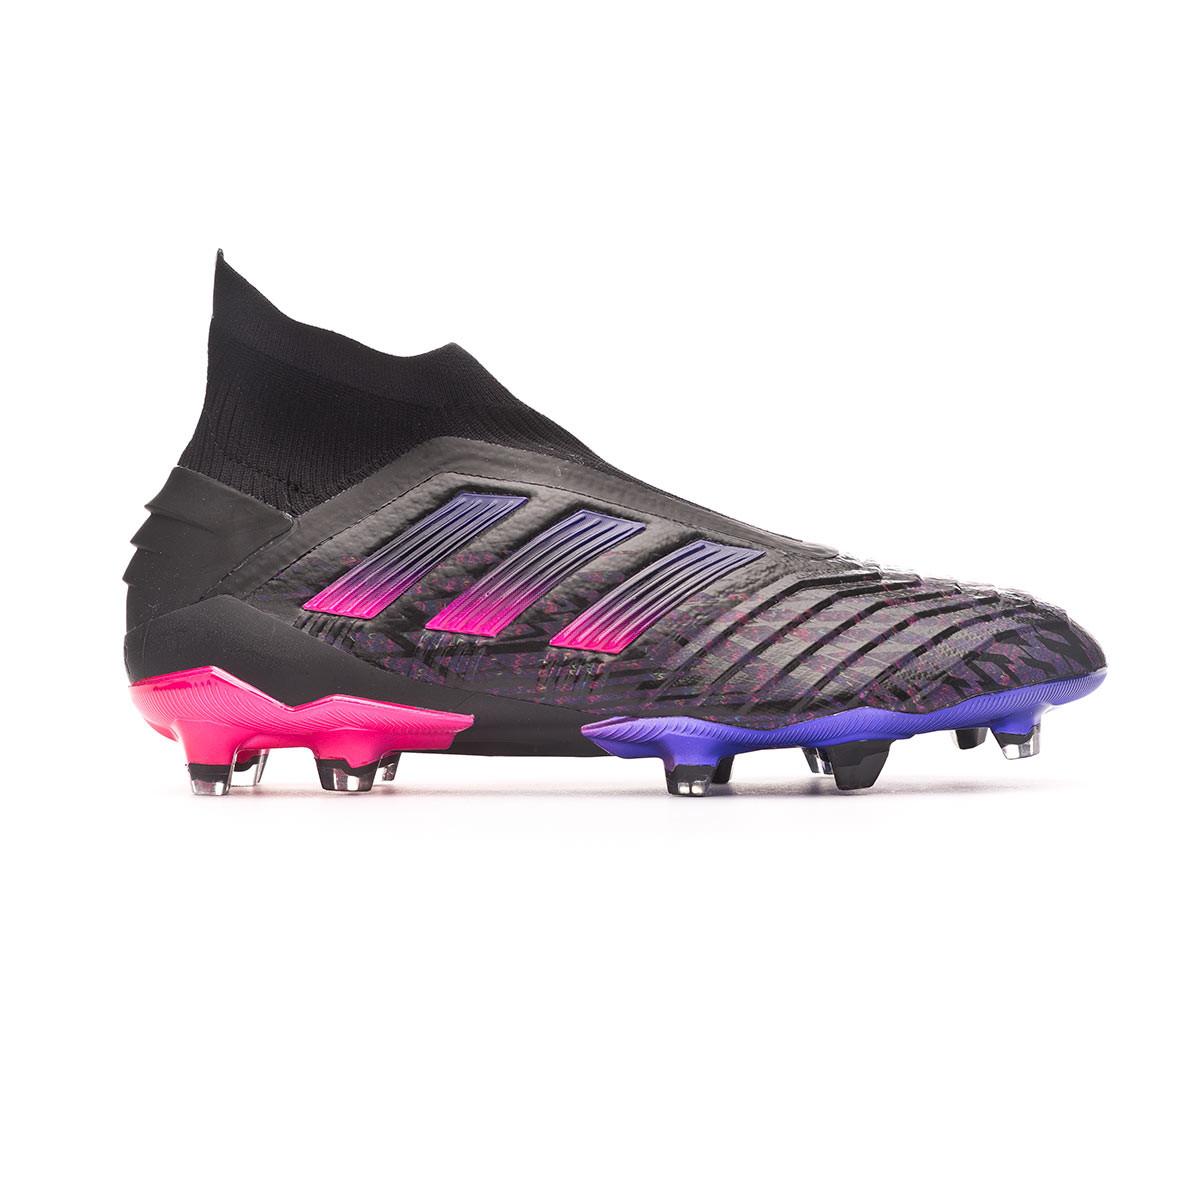 Chaussure de foot adidas Predator 19+ FG Paul Pogba